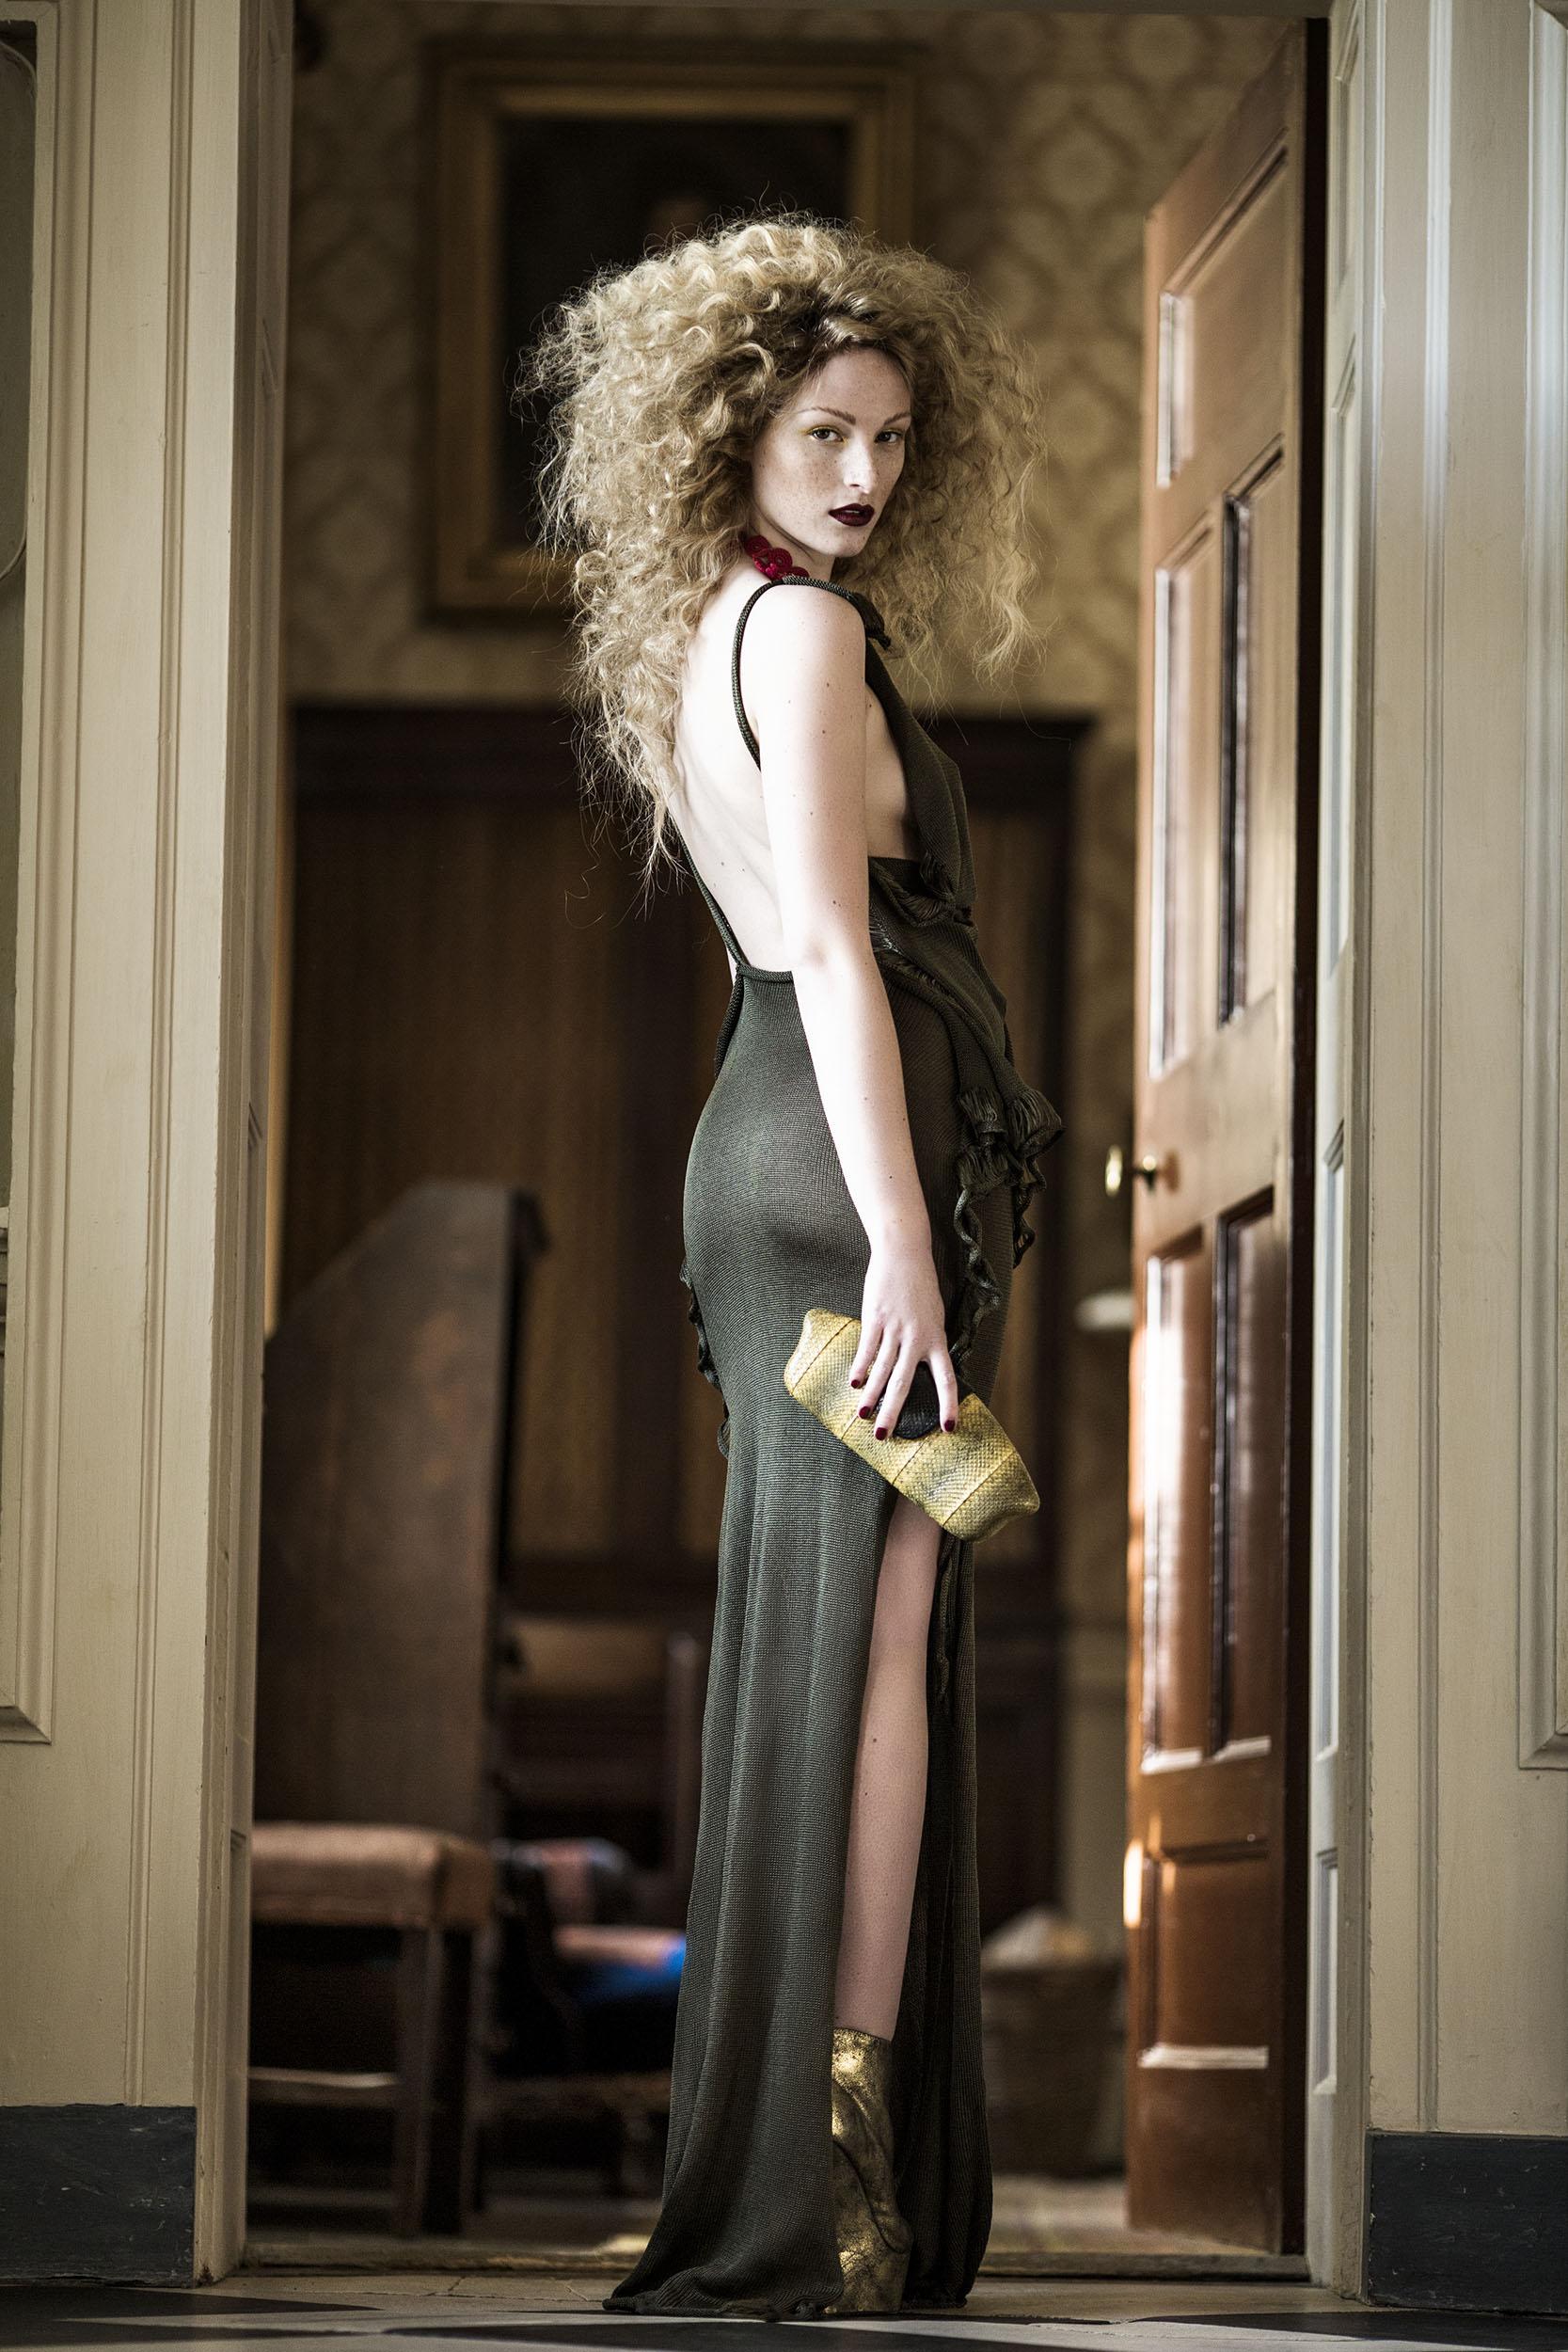 Ediorial_Fashion_Amber_Bolger_Photography_43.jpg